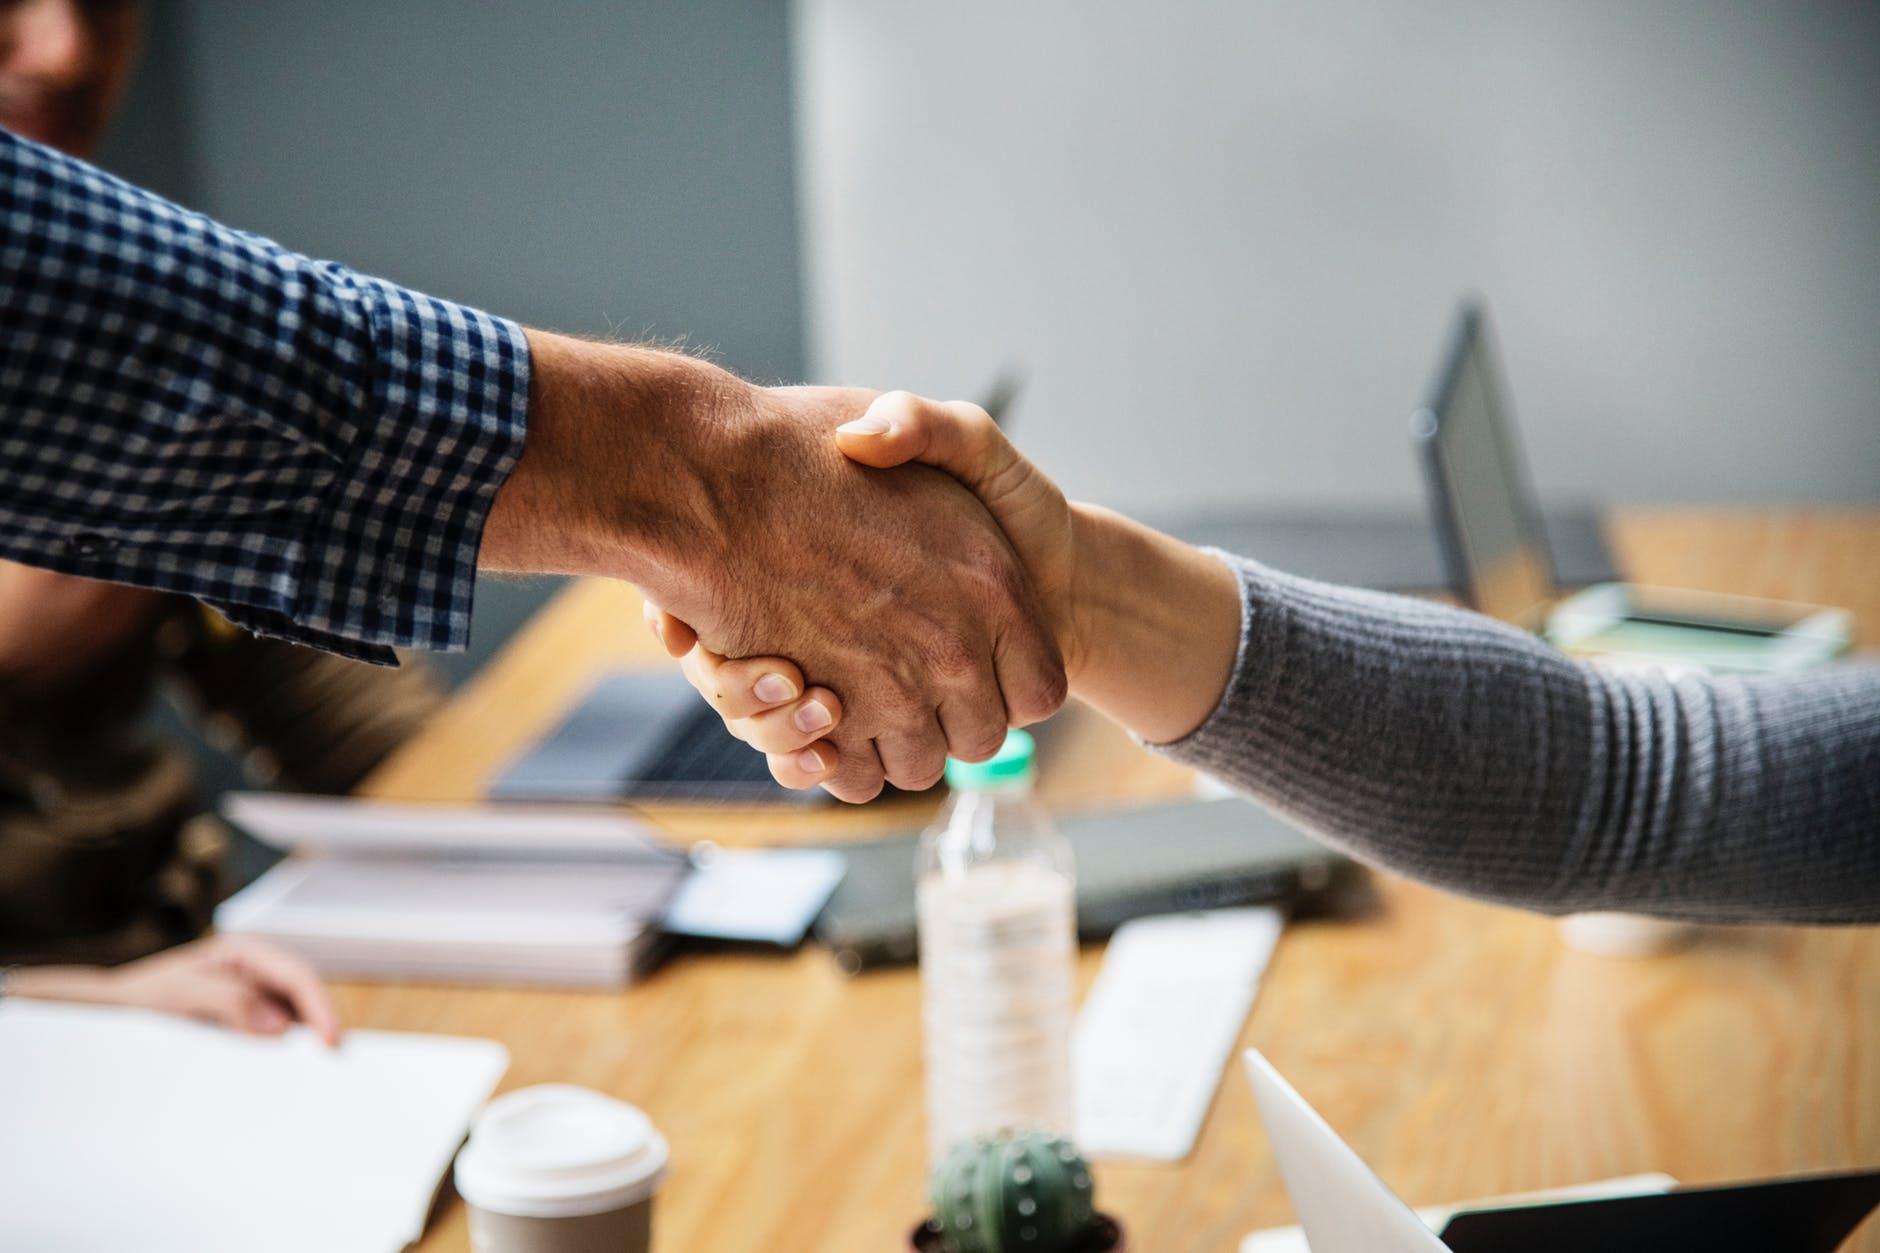 two person doing handshake beside table inside room